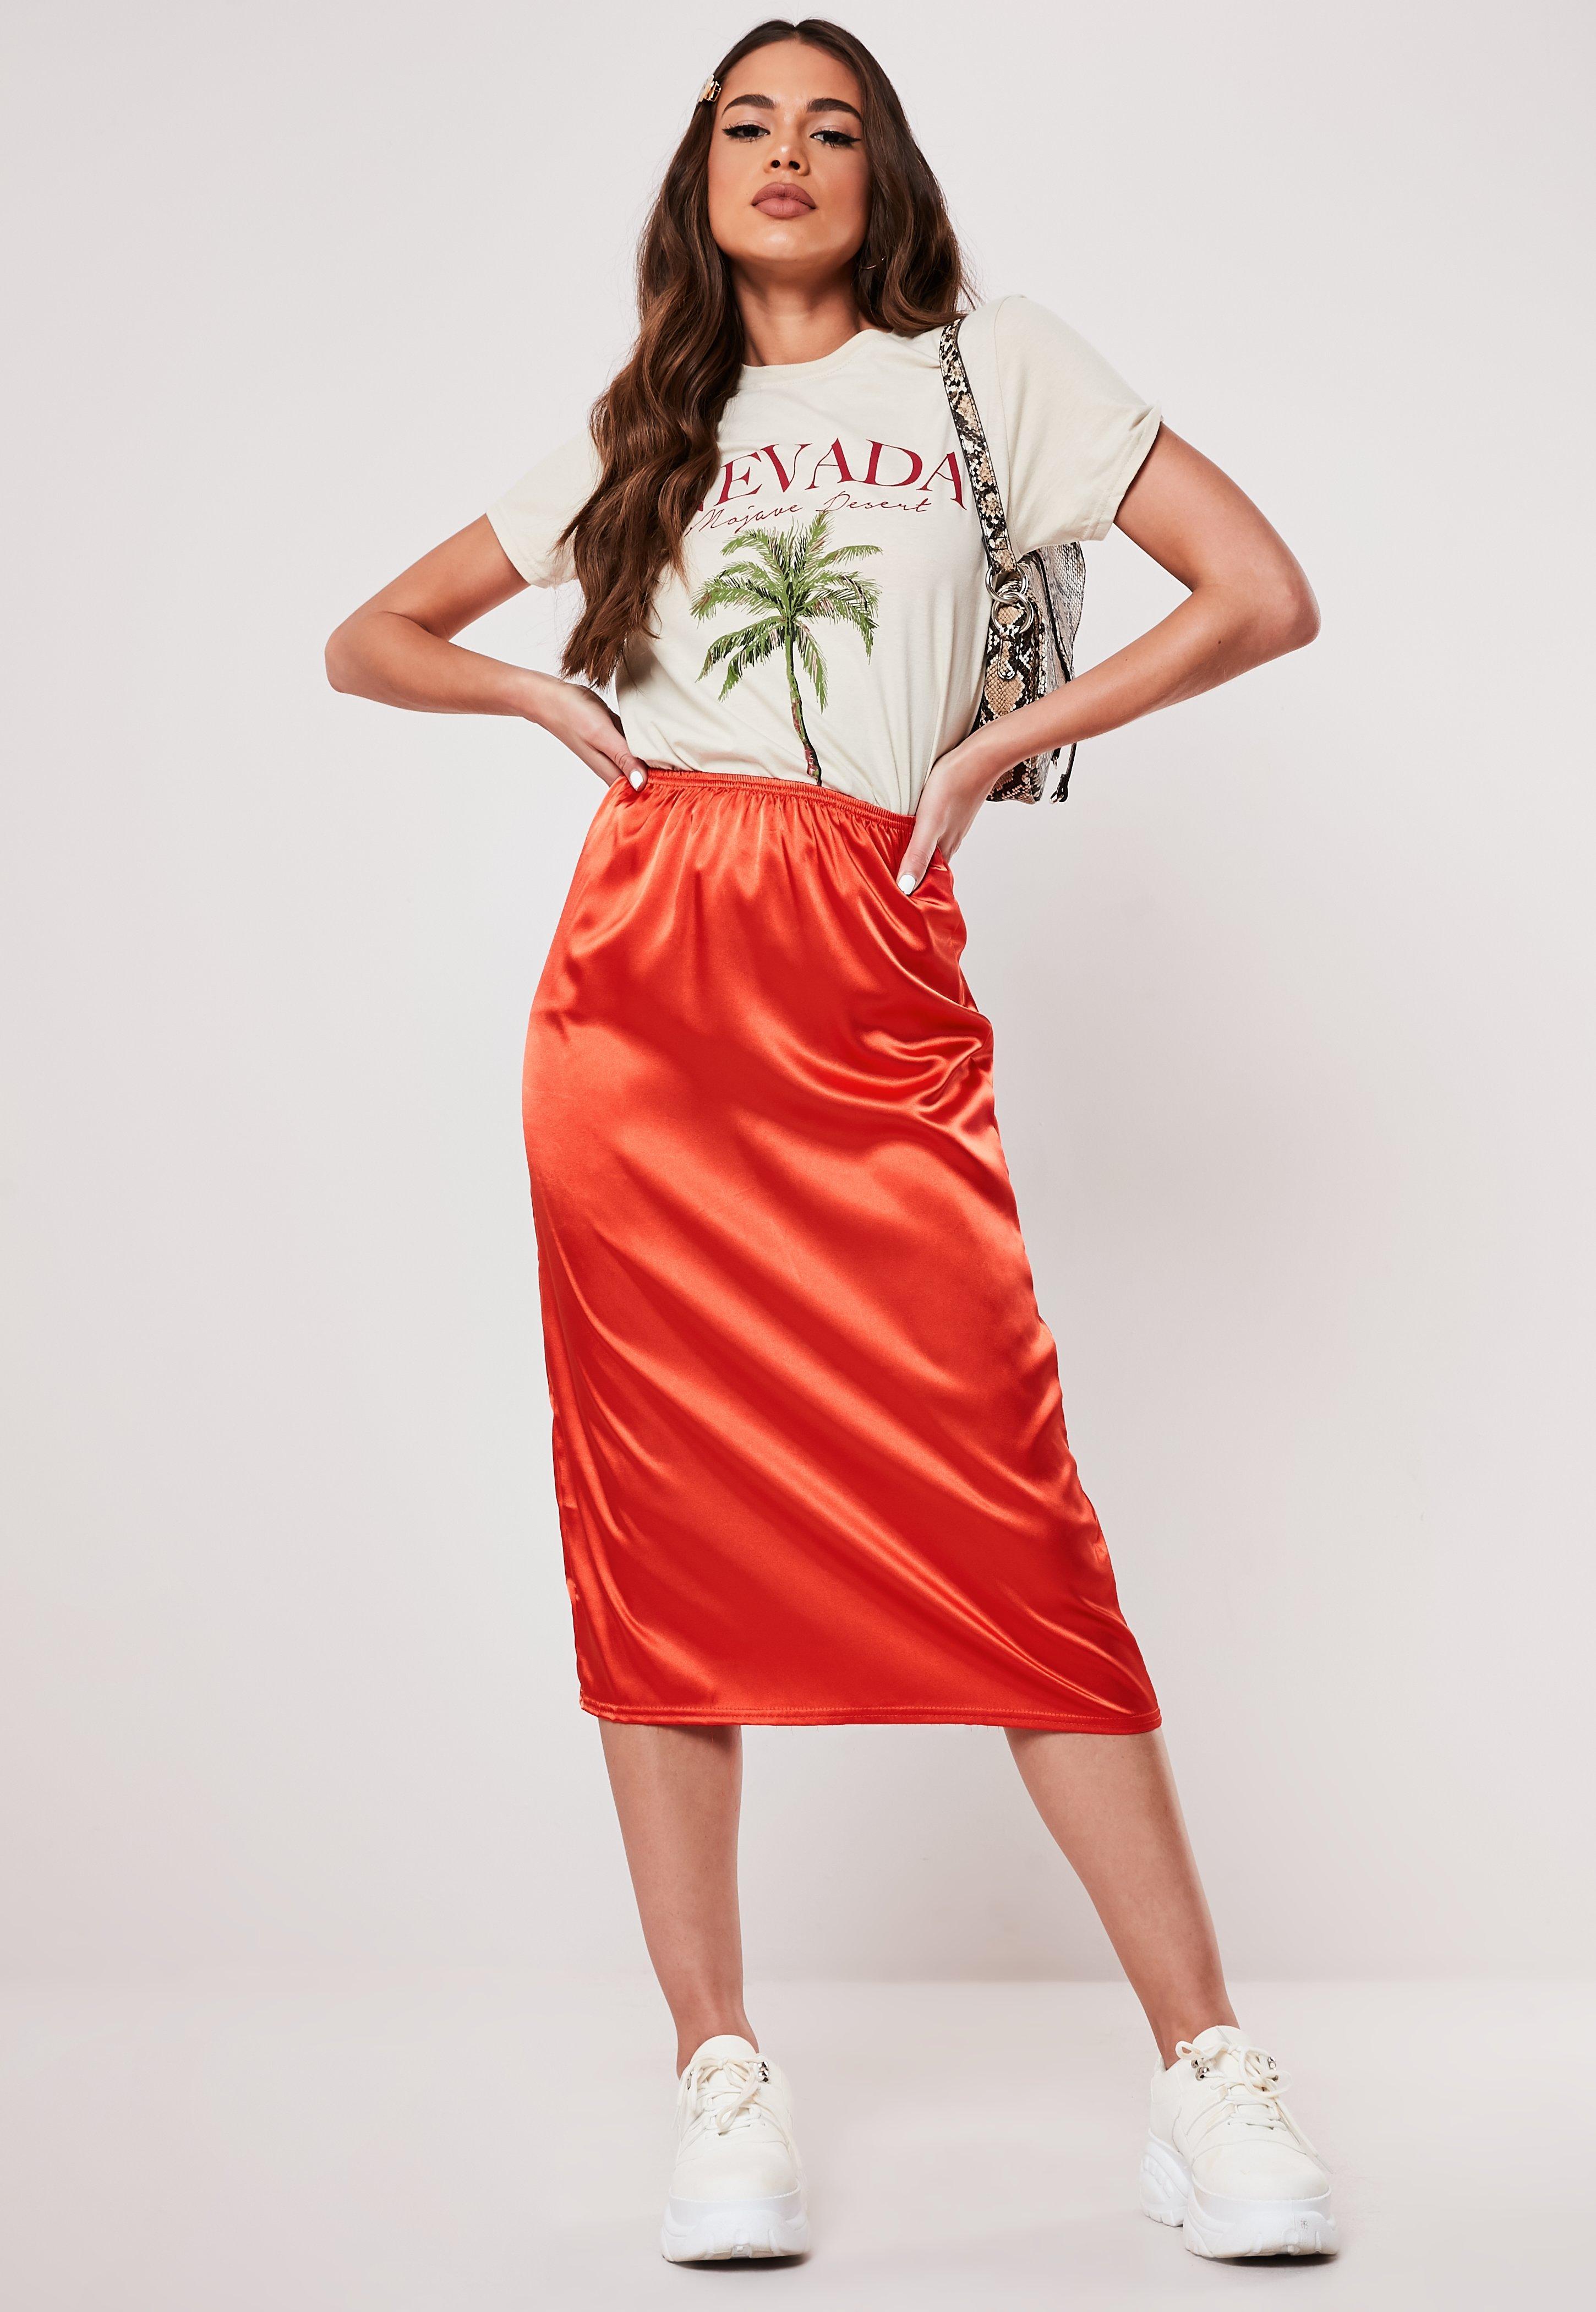 68f4ce7ecd Clothes Sale - Women's Cheap Clothes UK - Missguided